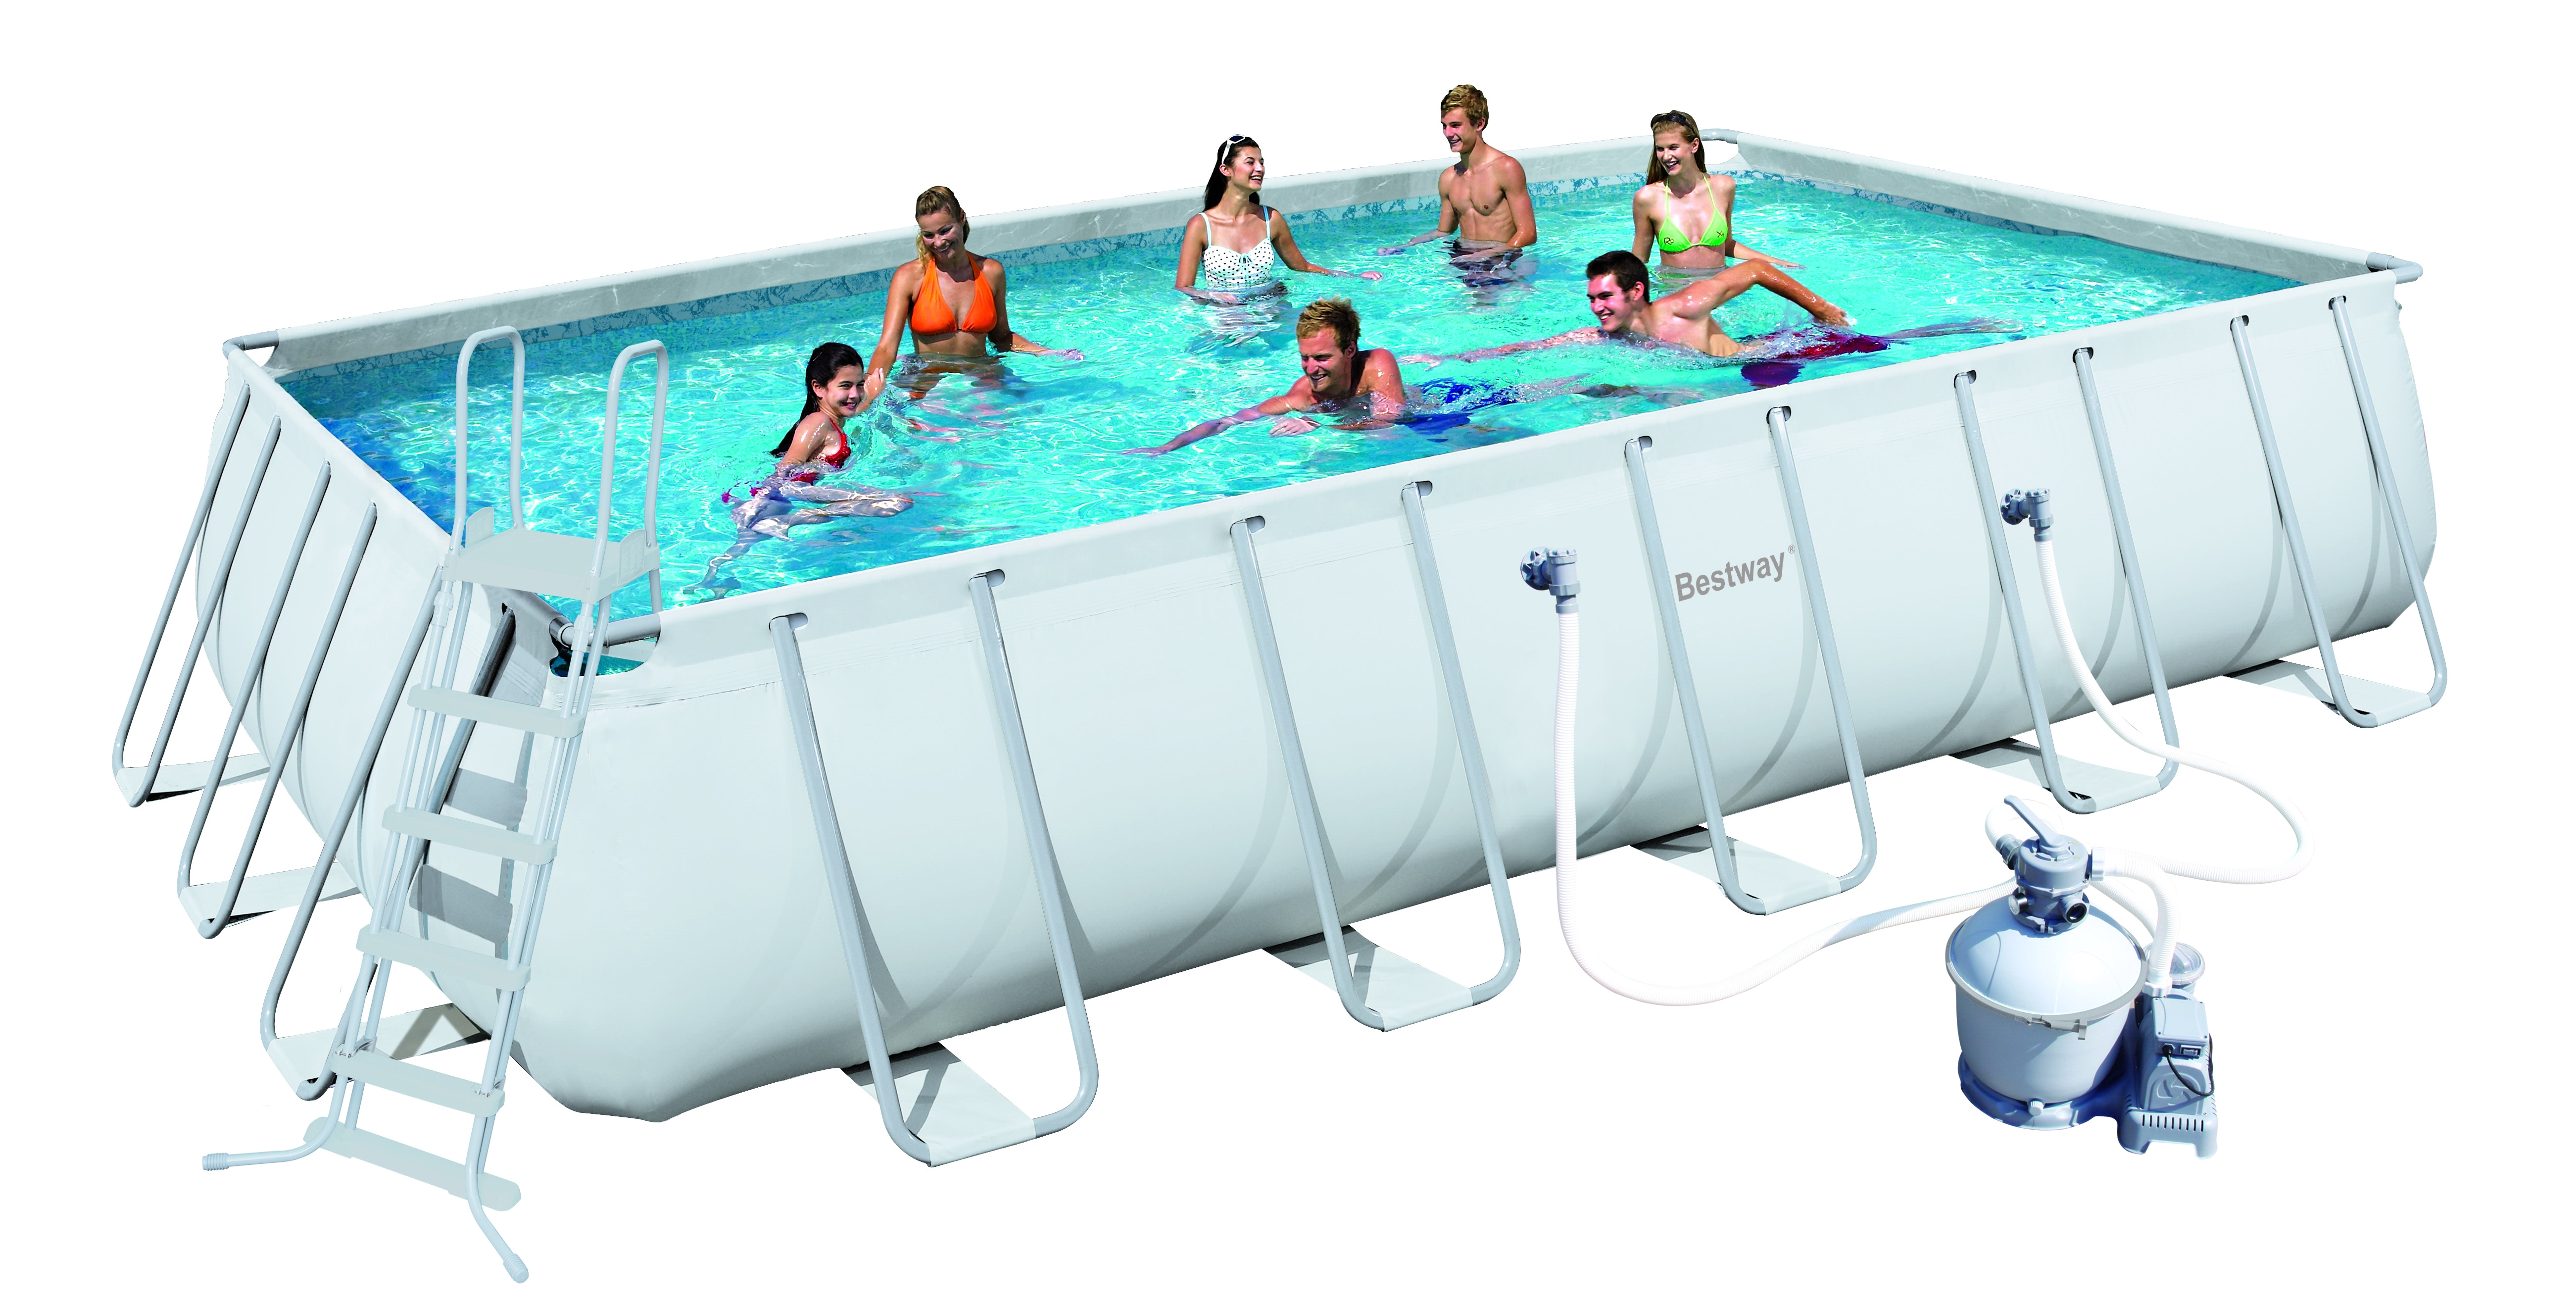 Piscina bestway ultra frame rettangolare 56257 for Bestway piscine